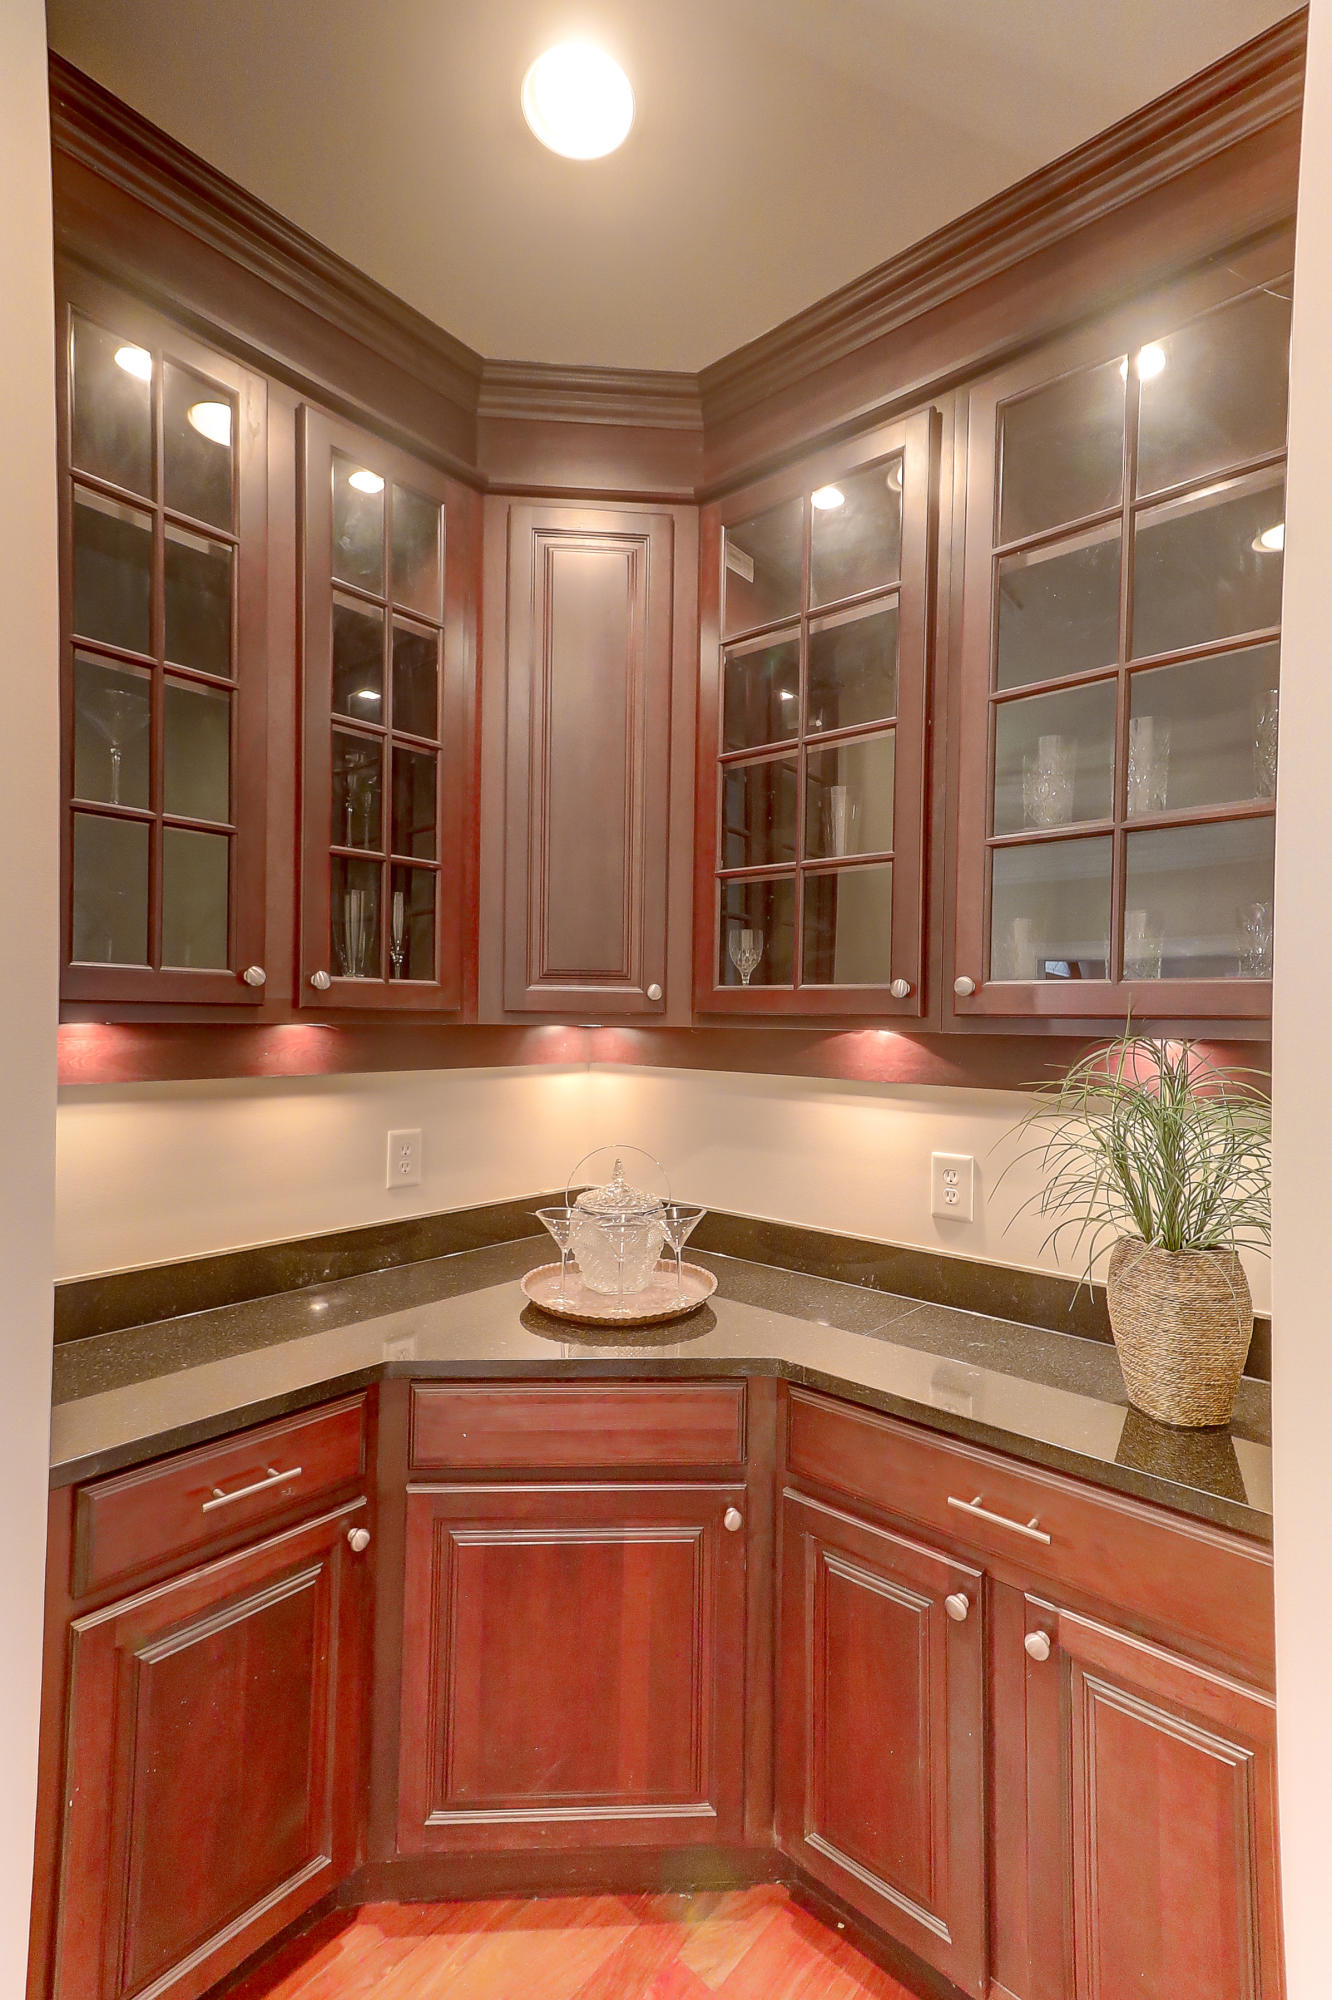 Dunes West Homes For Sale - 2996 Pignatelli Crescent, Mount Pleasant, SC - 105